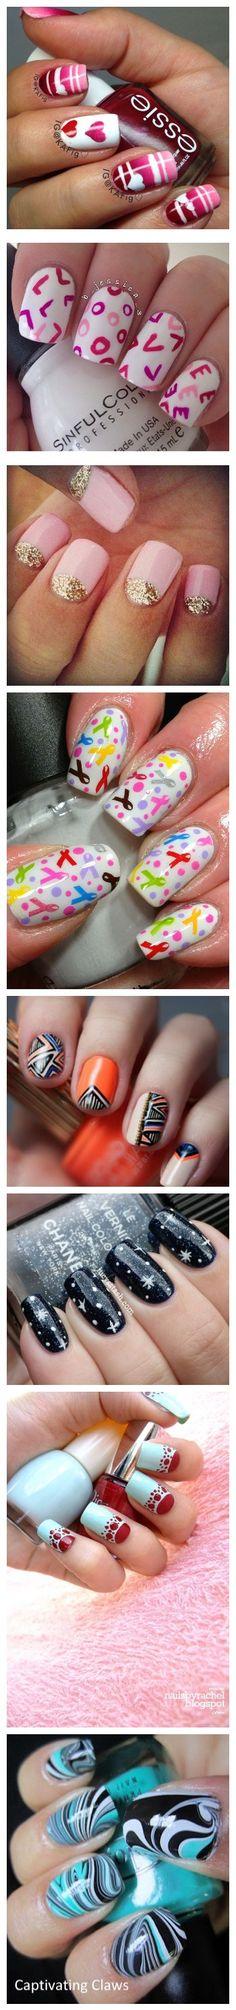 Nail Design Collection